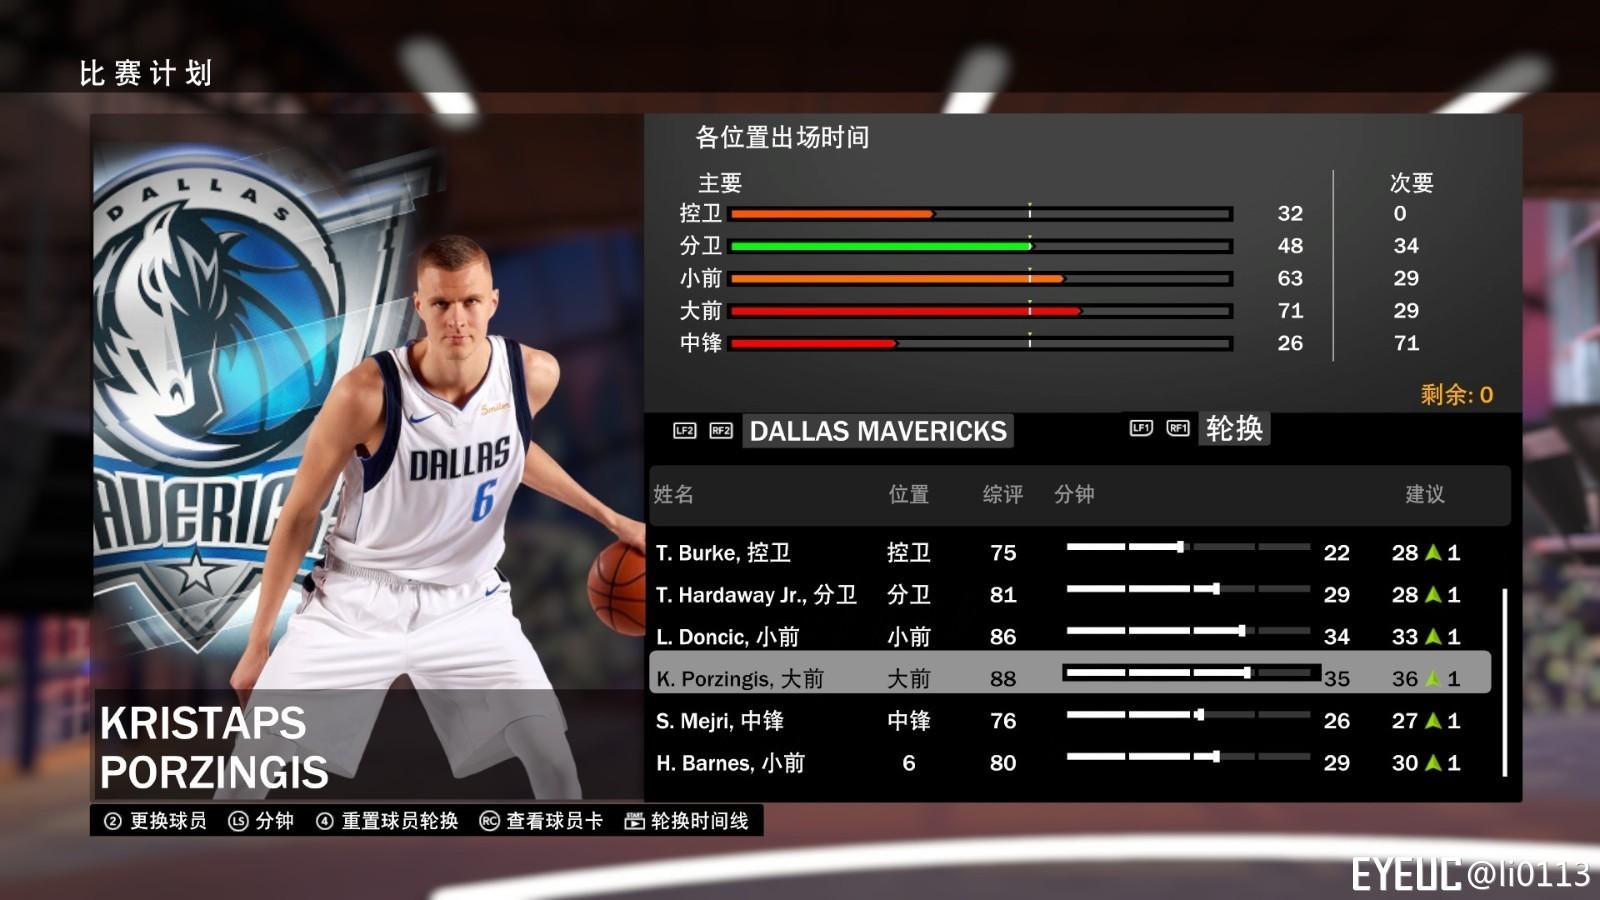 e844af217 NBA 2K19 - Kristaps Porzingis Portrait Update  Dallas Mavericks ...